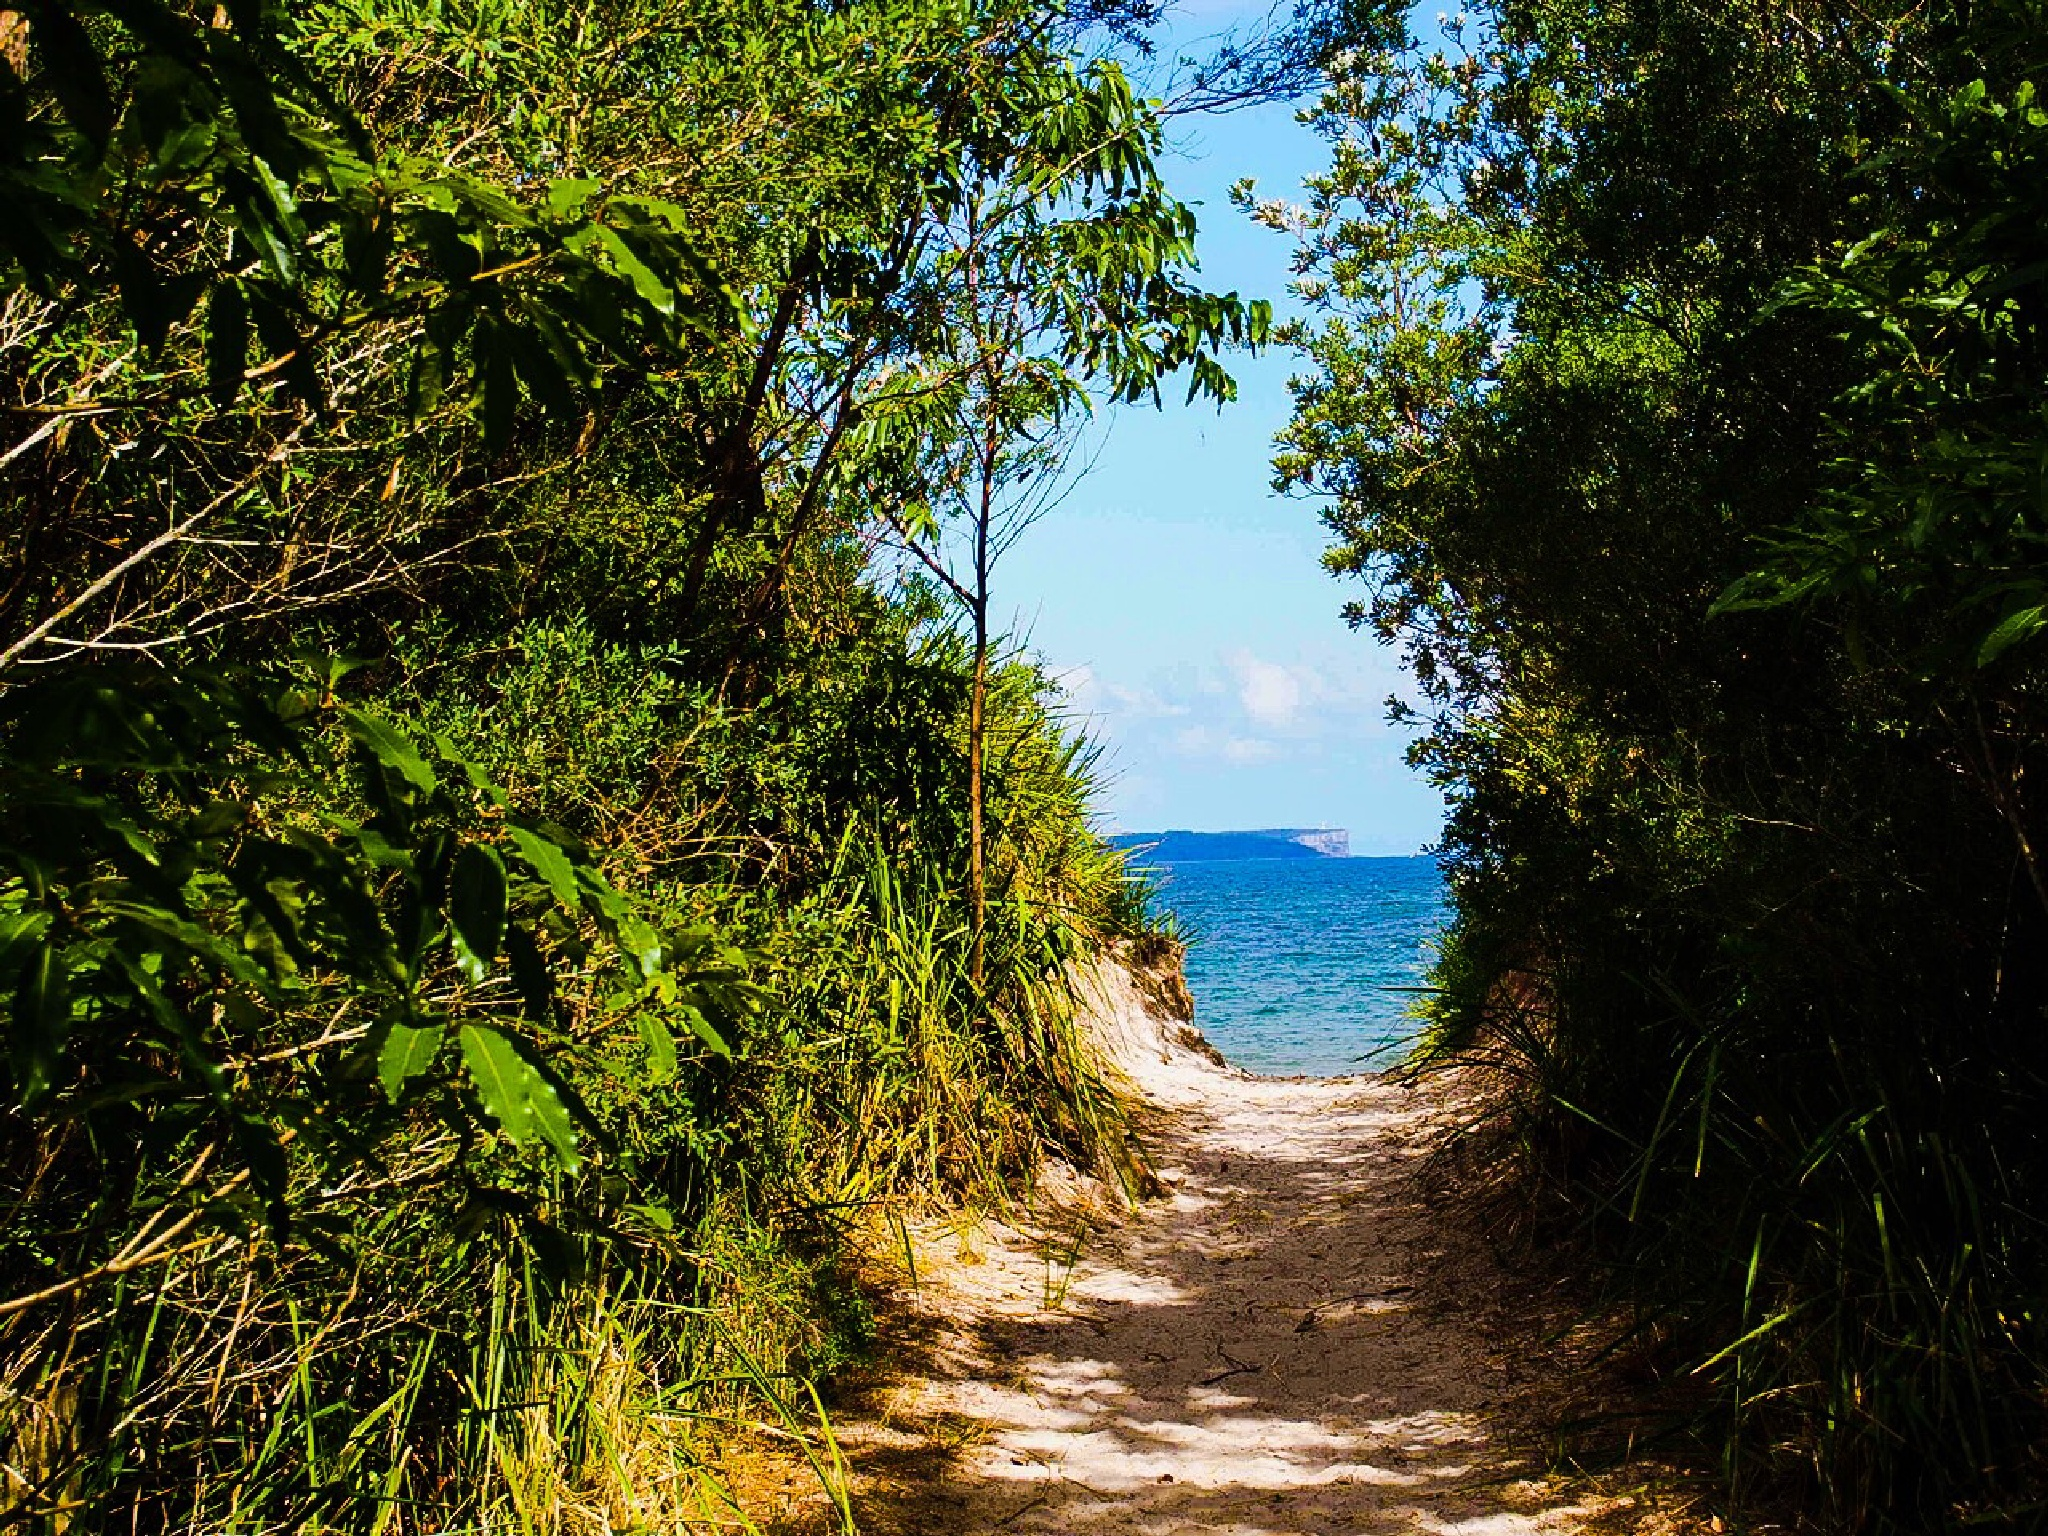 To the beach ... by djskinnylatte